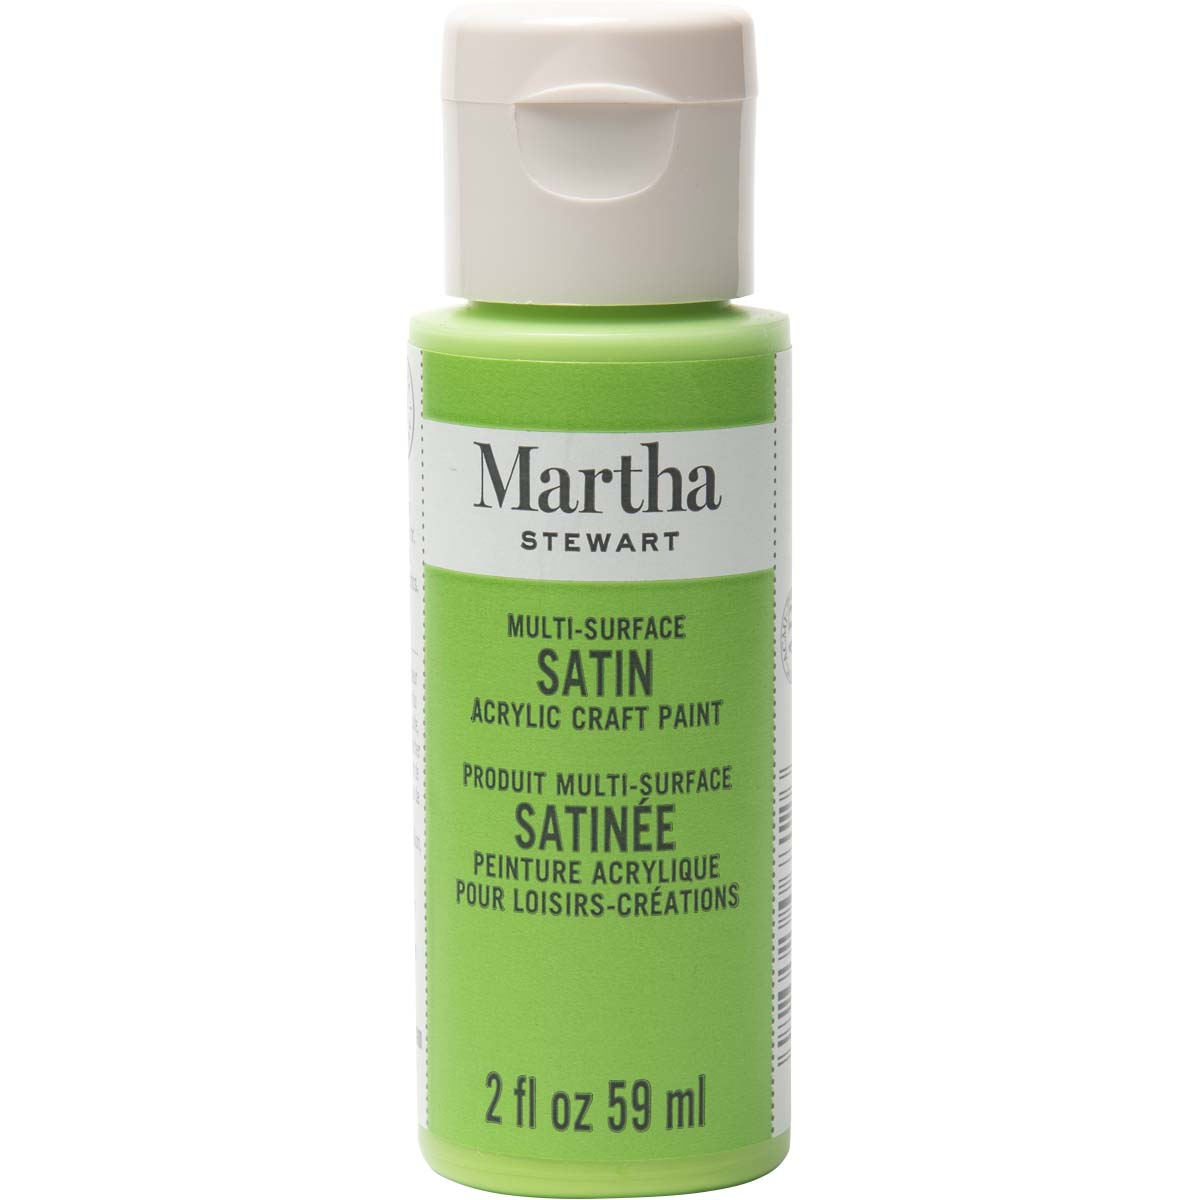 Martha Stewart® 2oz Multi-Surface Satin Acrylic Craft Paint - Snow Pea